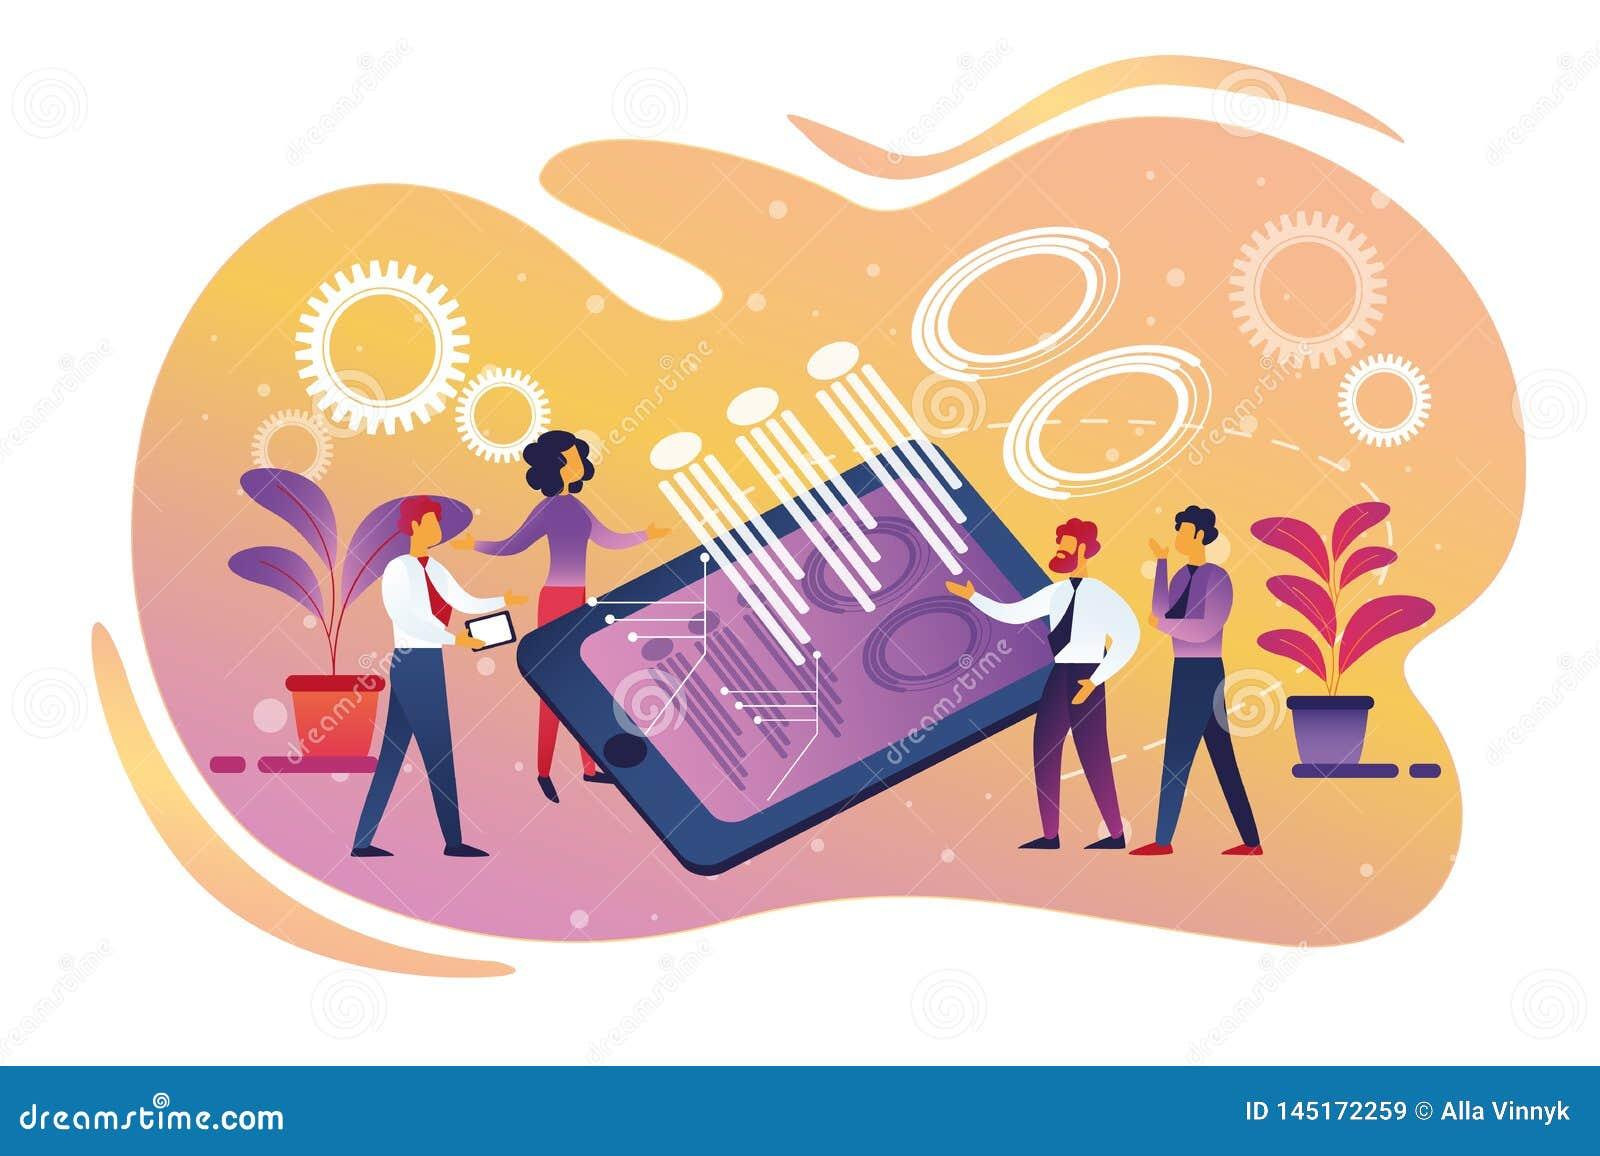 Company Teamwork, Cooperation, Smart Technology